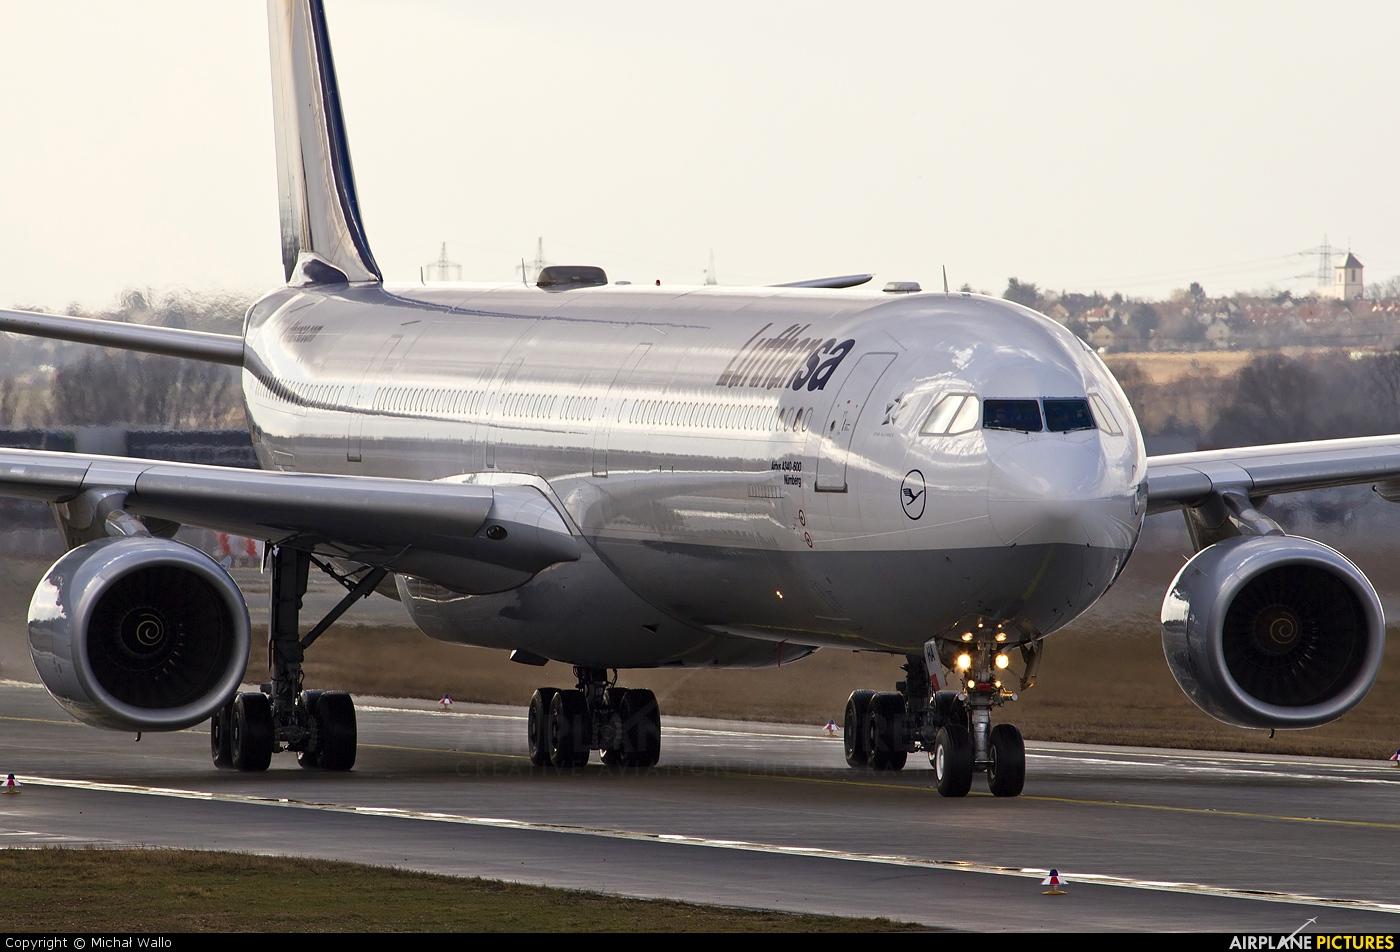 d aiha lufthansa airbus a340 600 at frankfurt photo id 188361 airplane. Black Bedroom Furniture Sets. Home Design Ideas